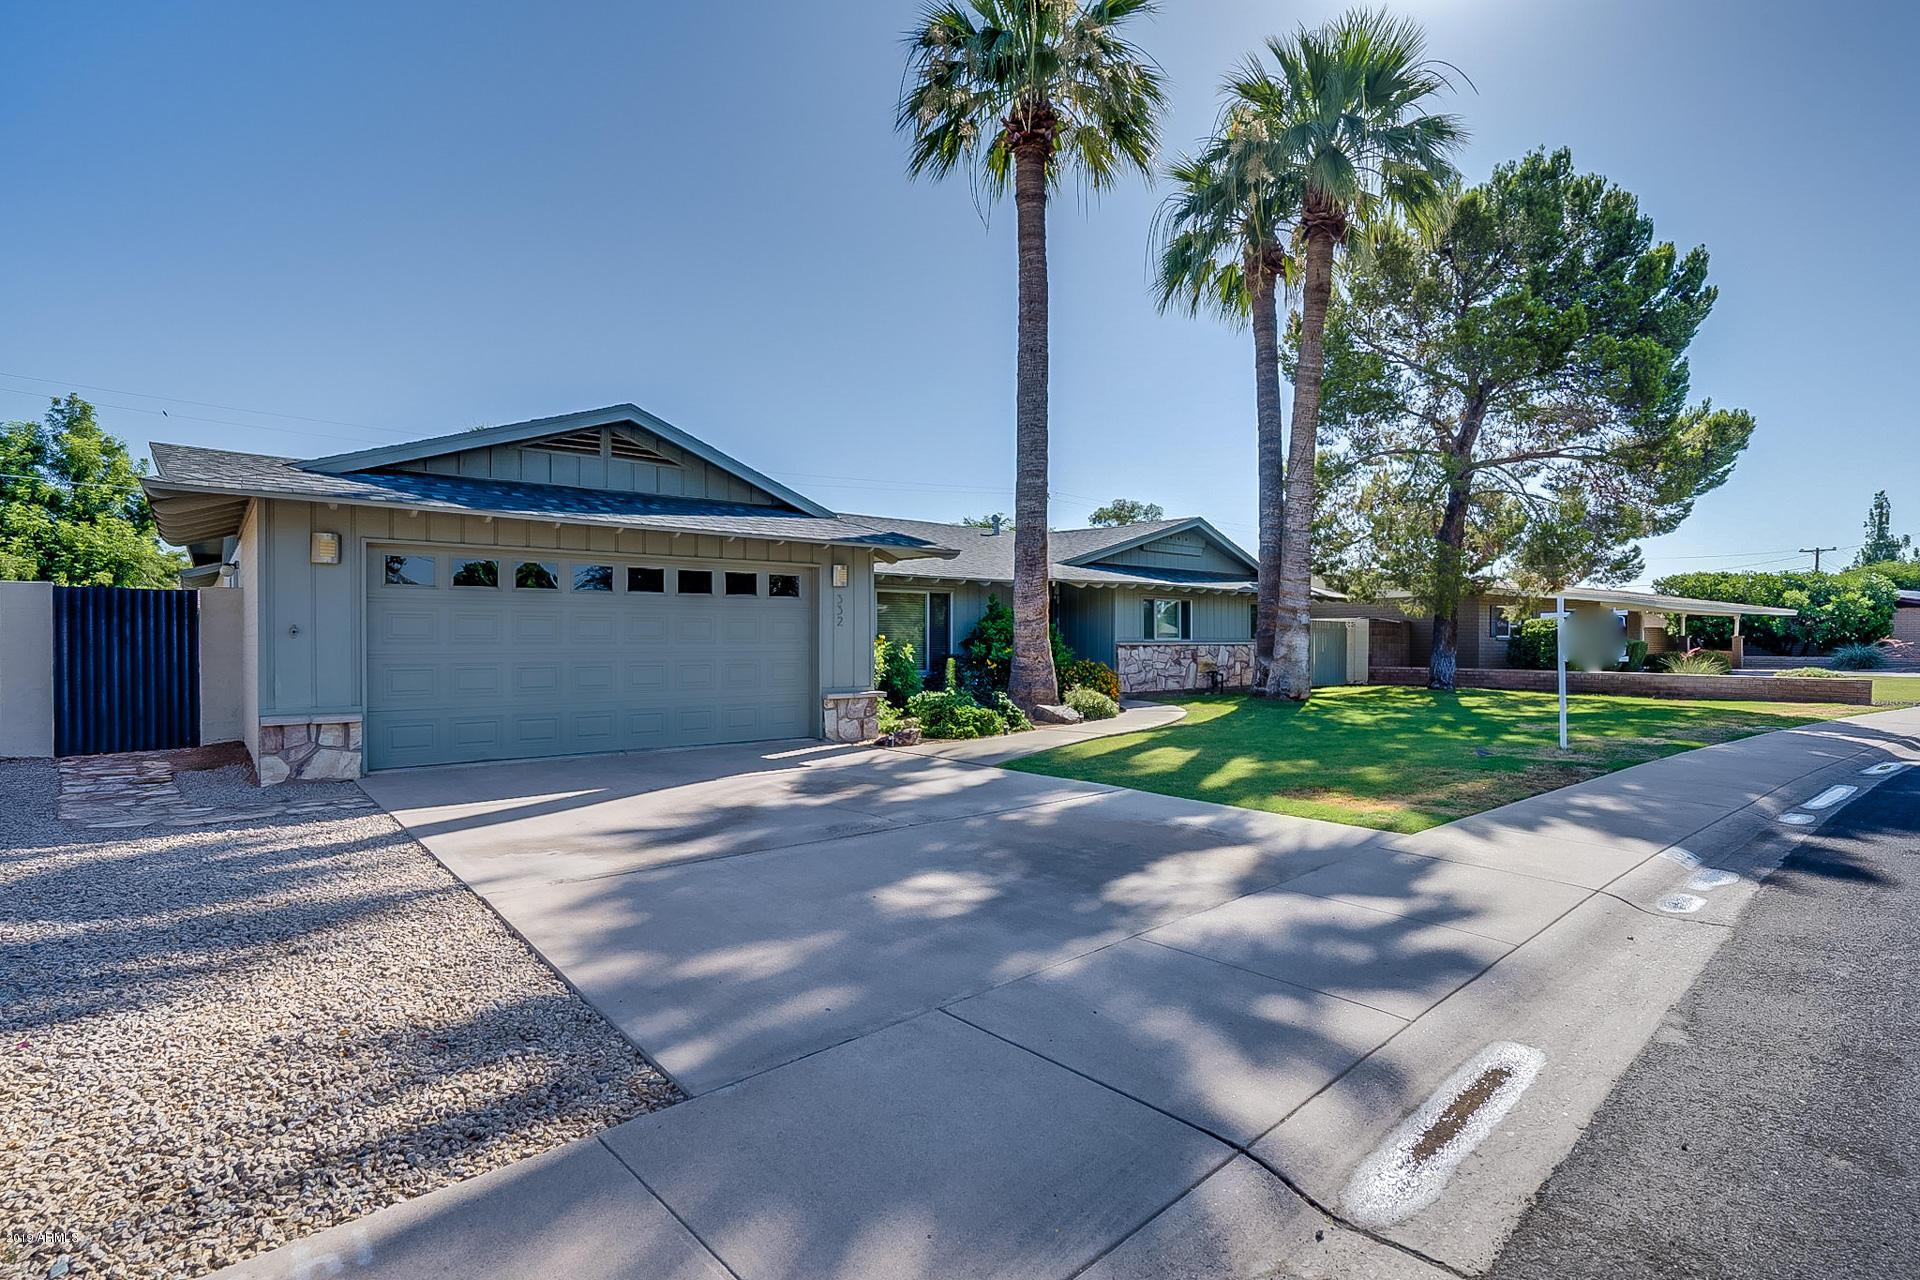 Photo of 332 E GENEVA Drive, Tempe, AZ 85282